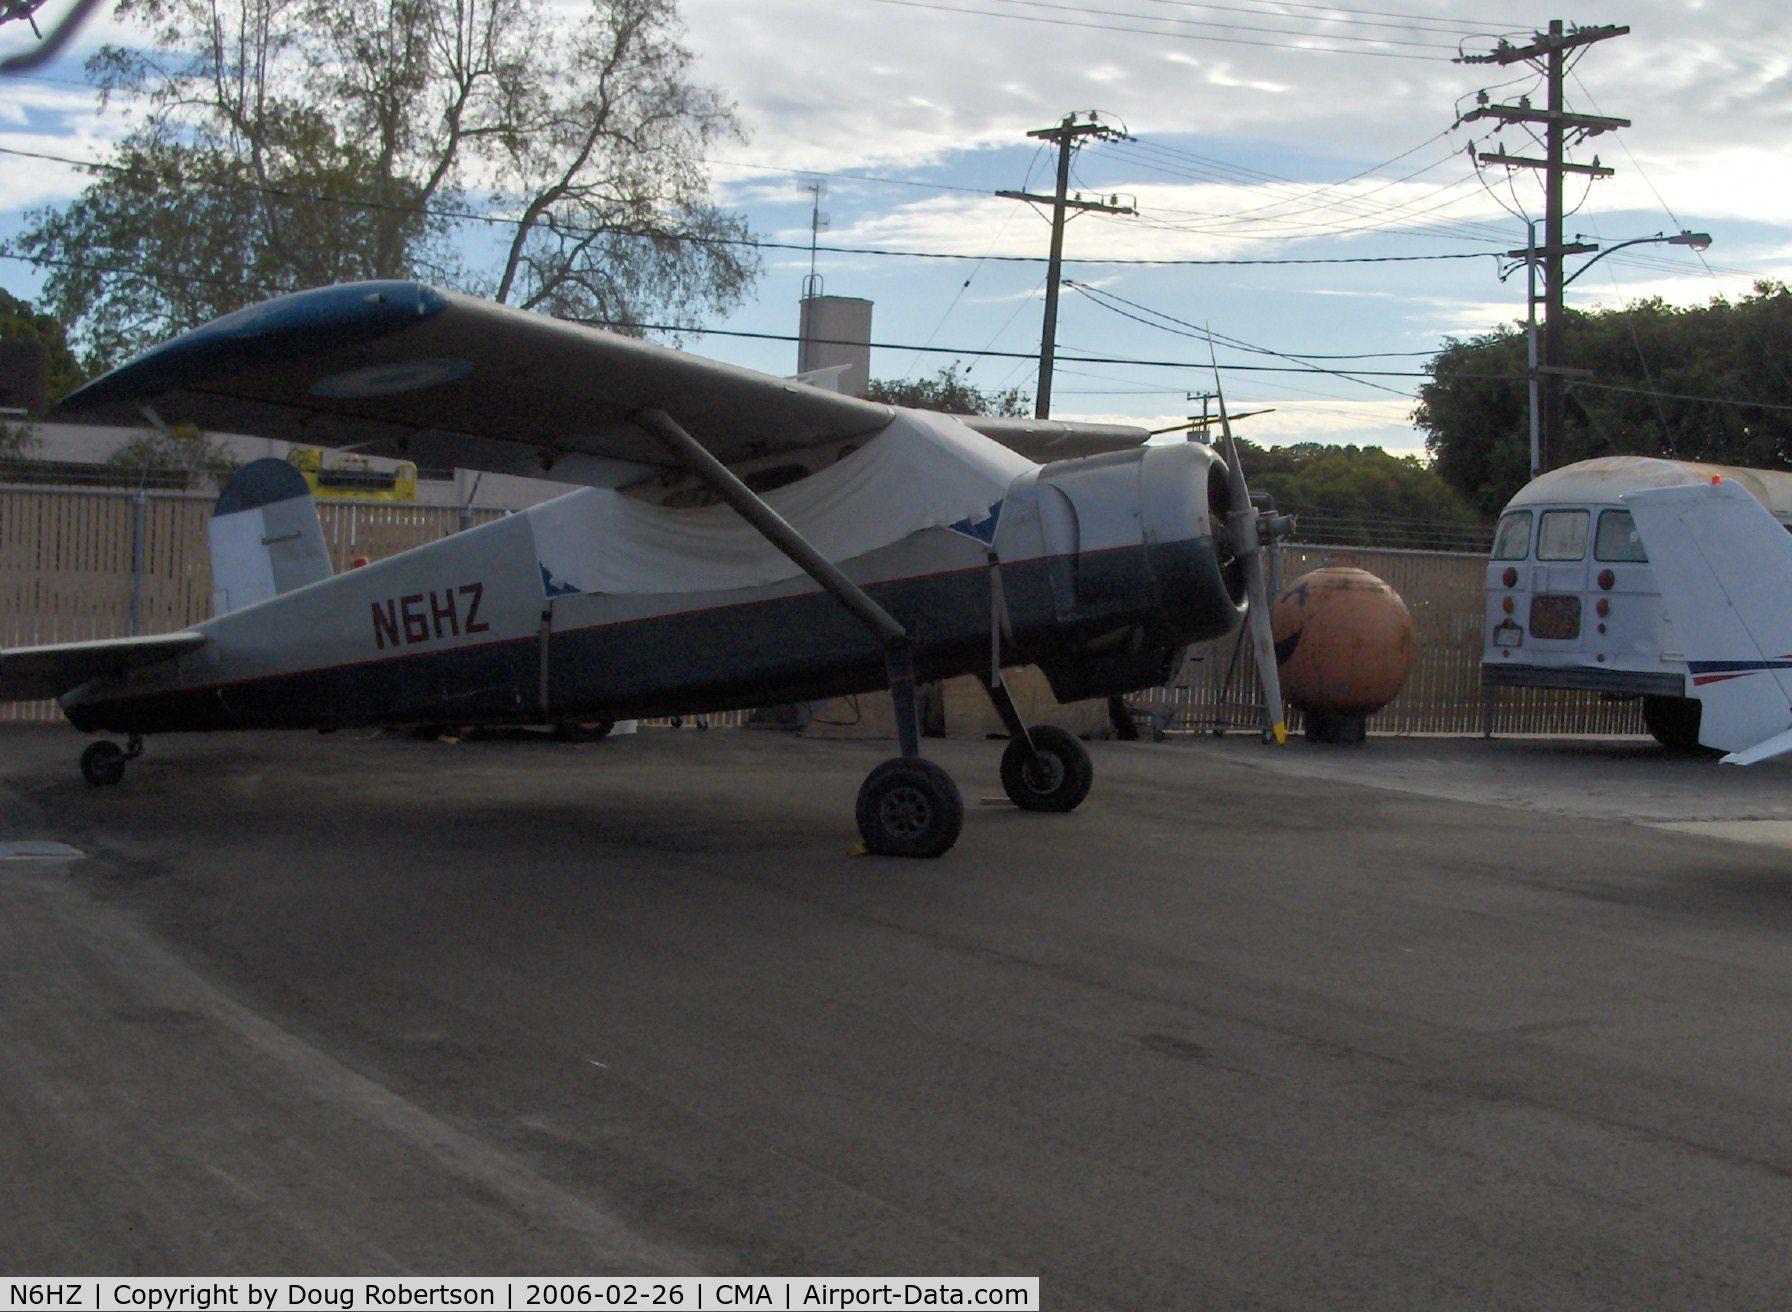 N6HZ, Max Holste MH-1521M Broussard C/N 25C, Avions Max Holste M.H.1521M BROUSSARD, P&W R-985 450 Hp